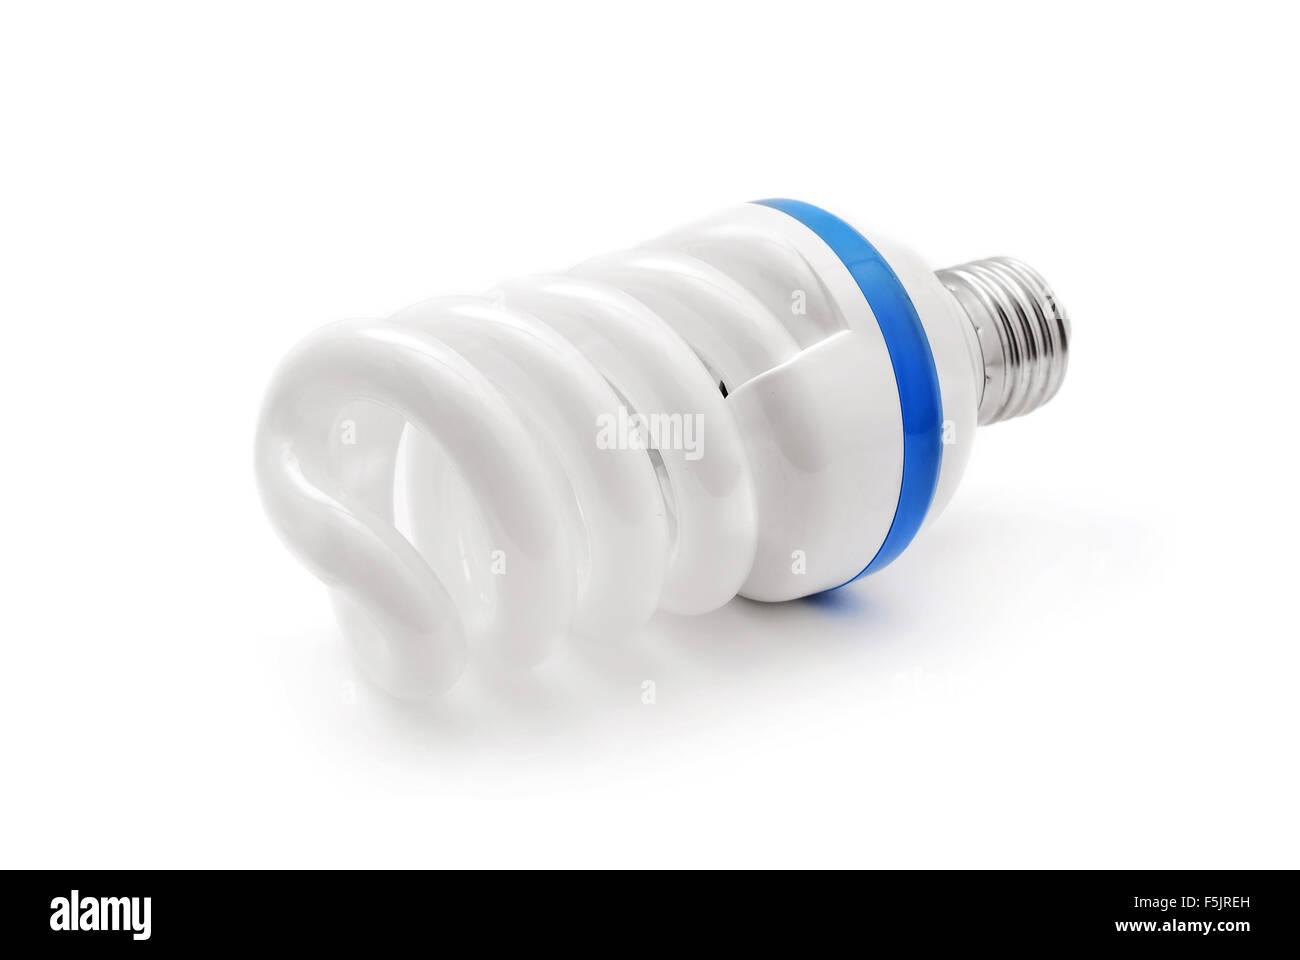 ecological light bulb - Stock Image